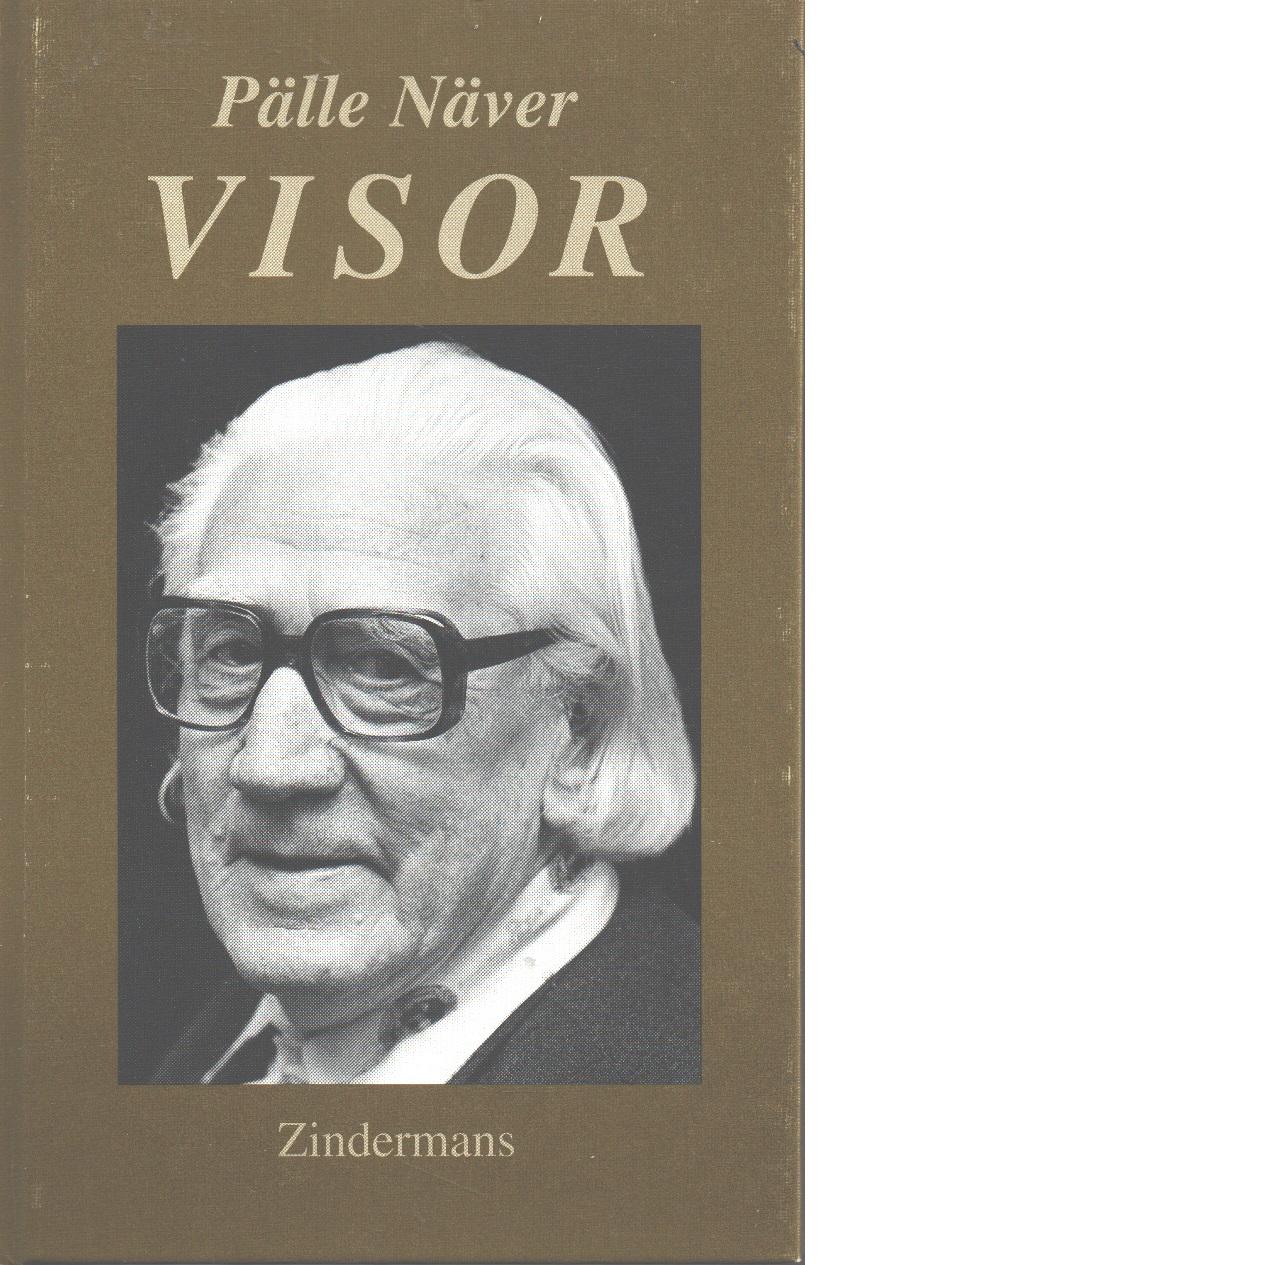 Visor / Pälle Näver - Högstedt, Josef